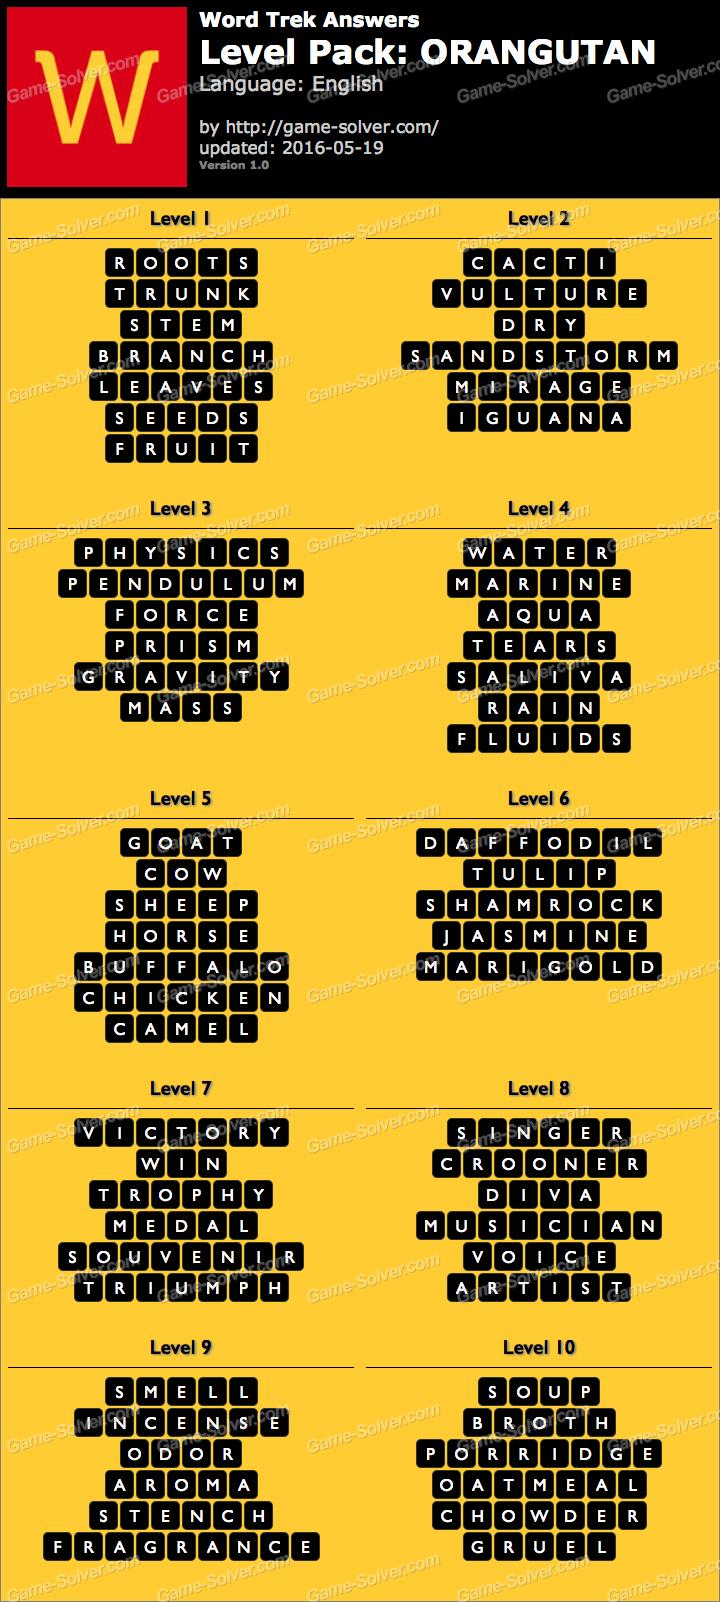 Word Trek Level Pack 51 ORANGUTAN Answers Game Solver